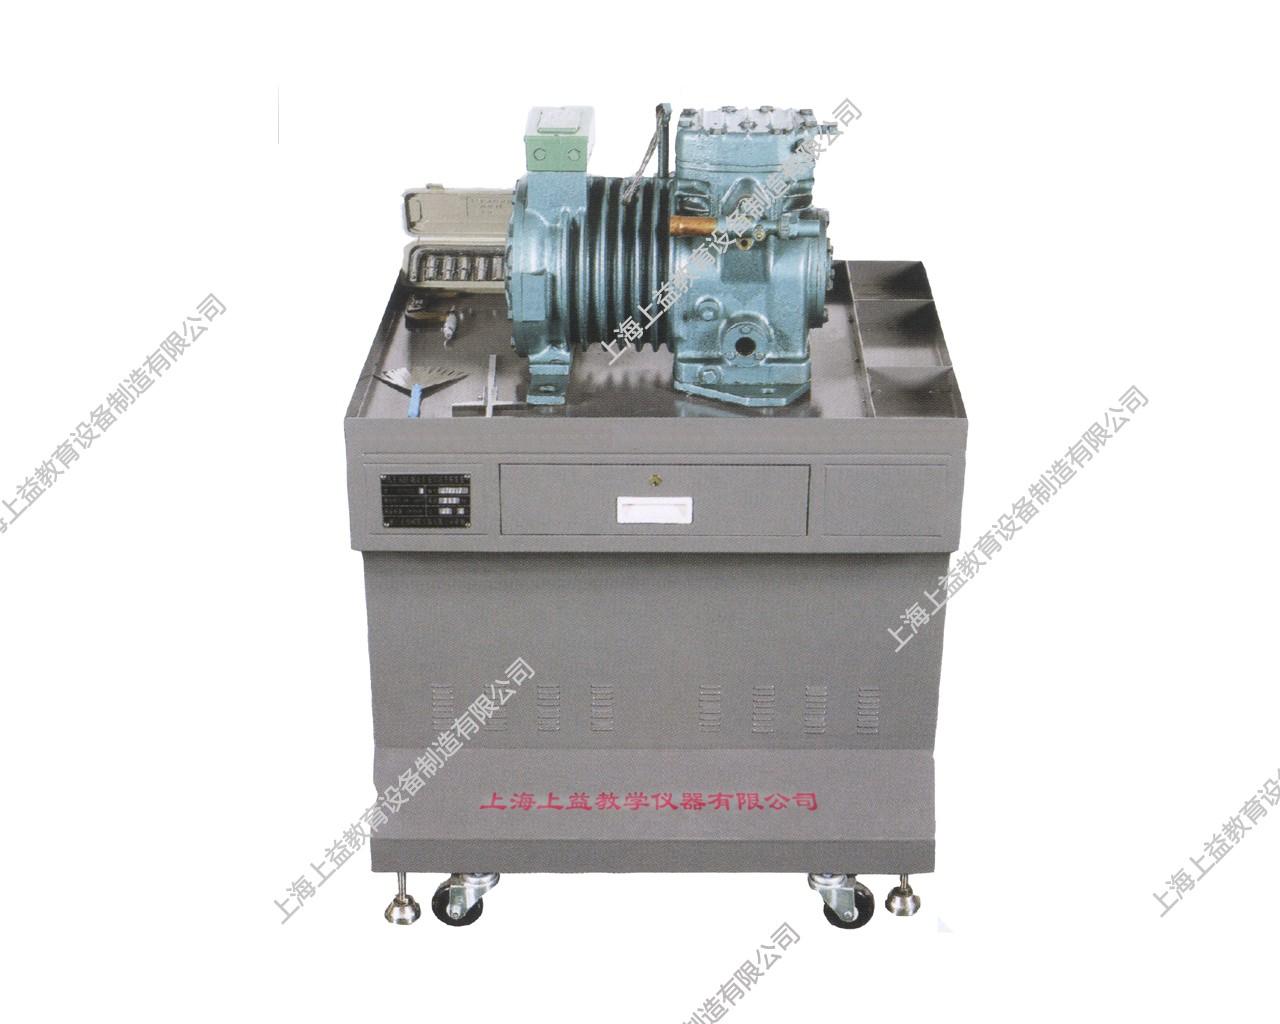 SYZLRX-01G型 制冷压缩机拆装wwwlehu8vip装置